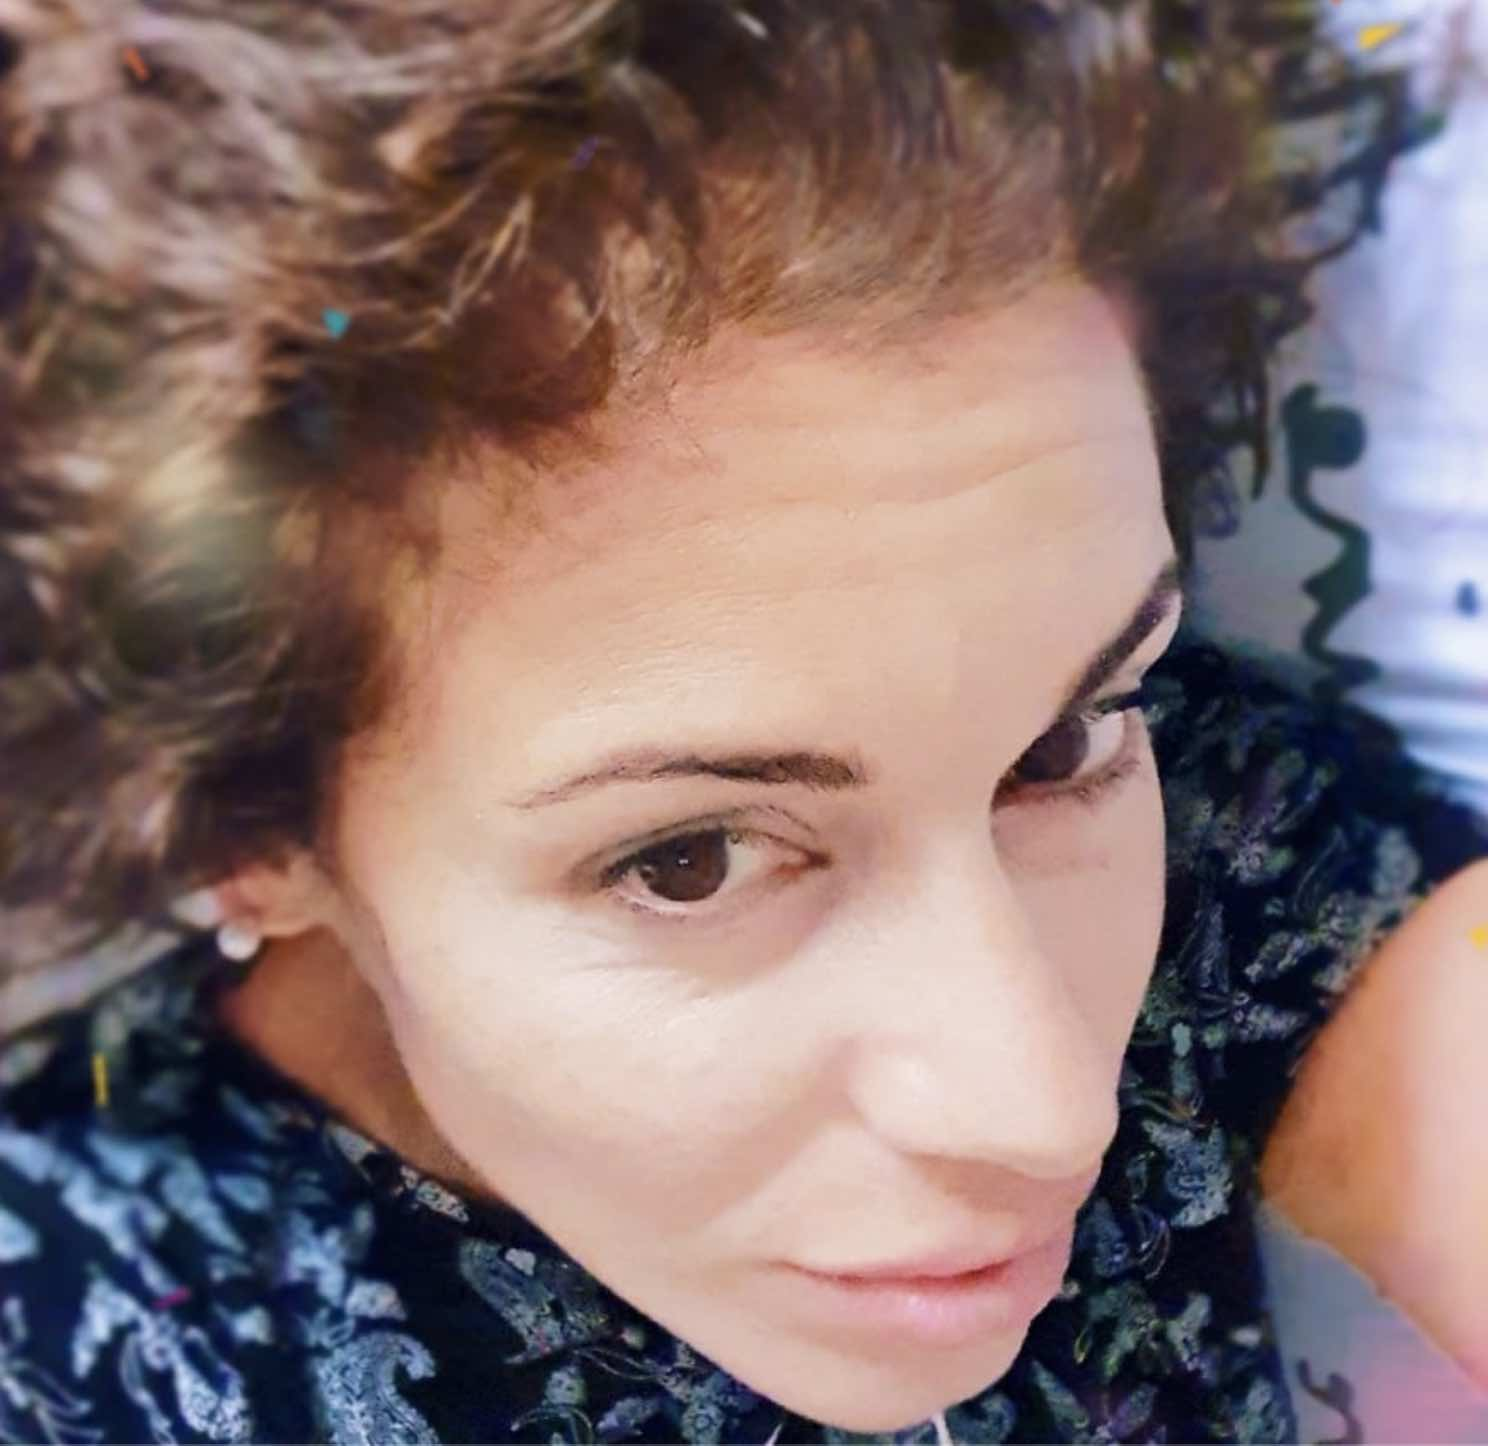 Raffaella Costa Dubaitaly